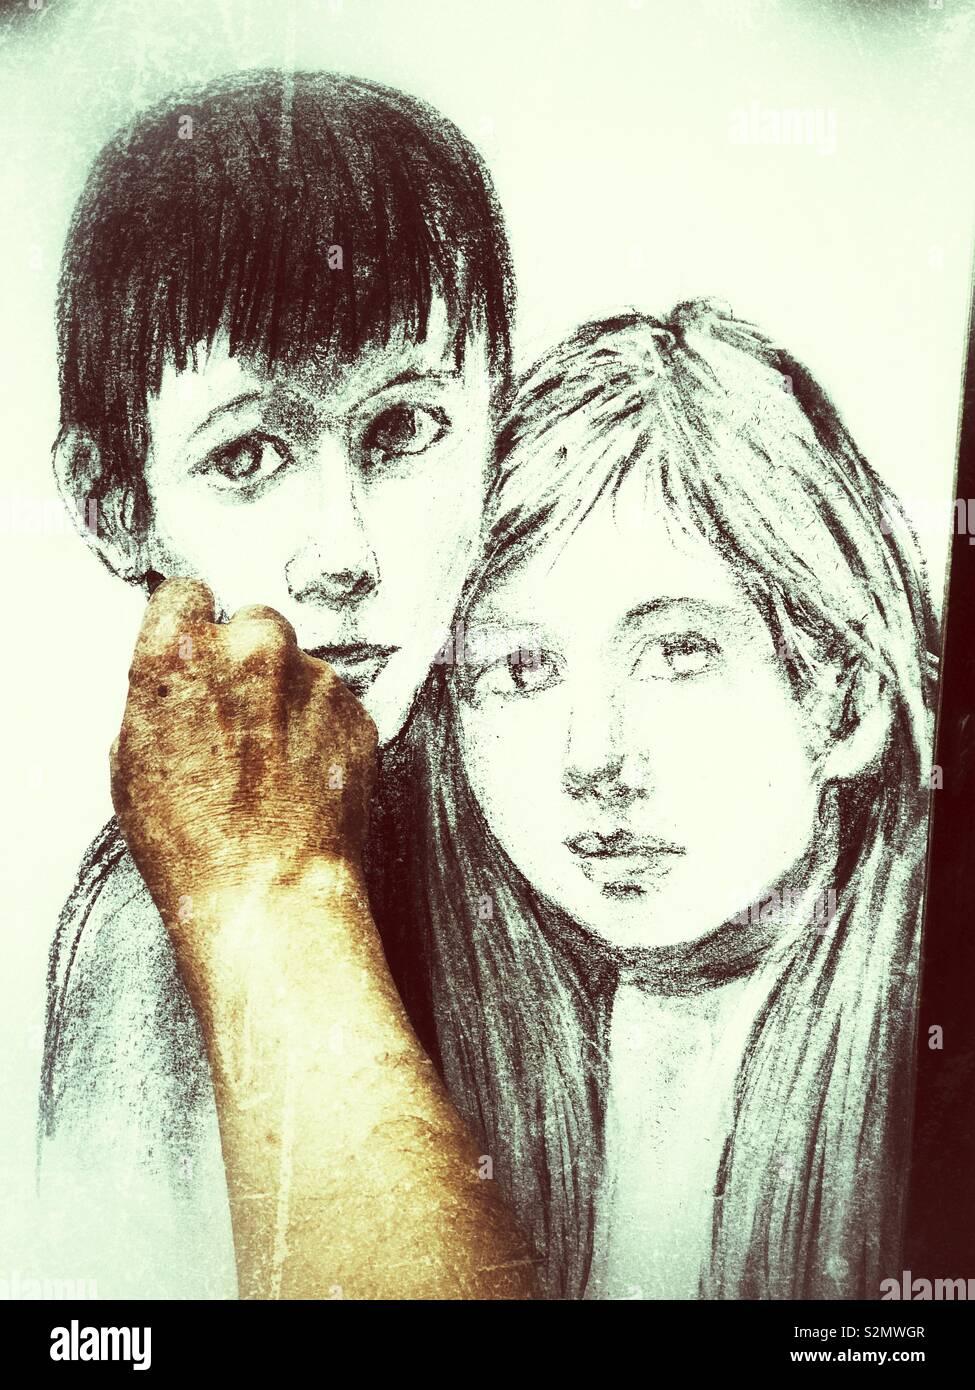 Montmartre artist sketching a boy and girl portrait paris france